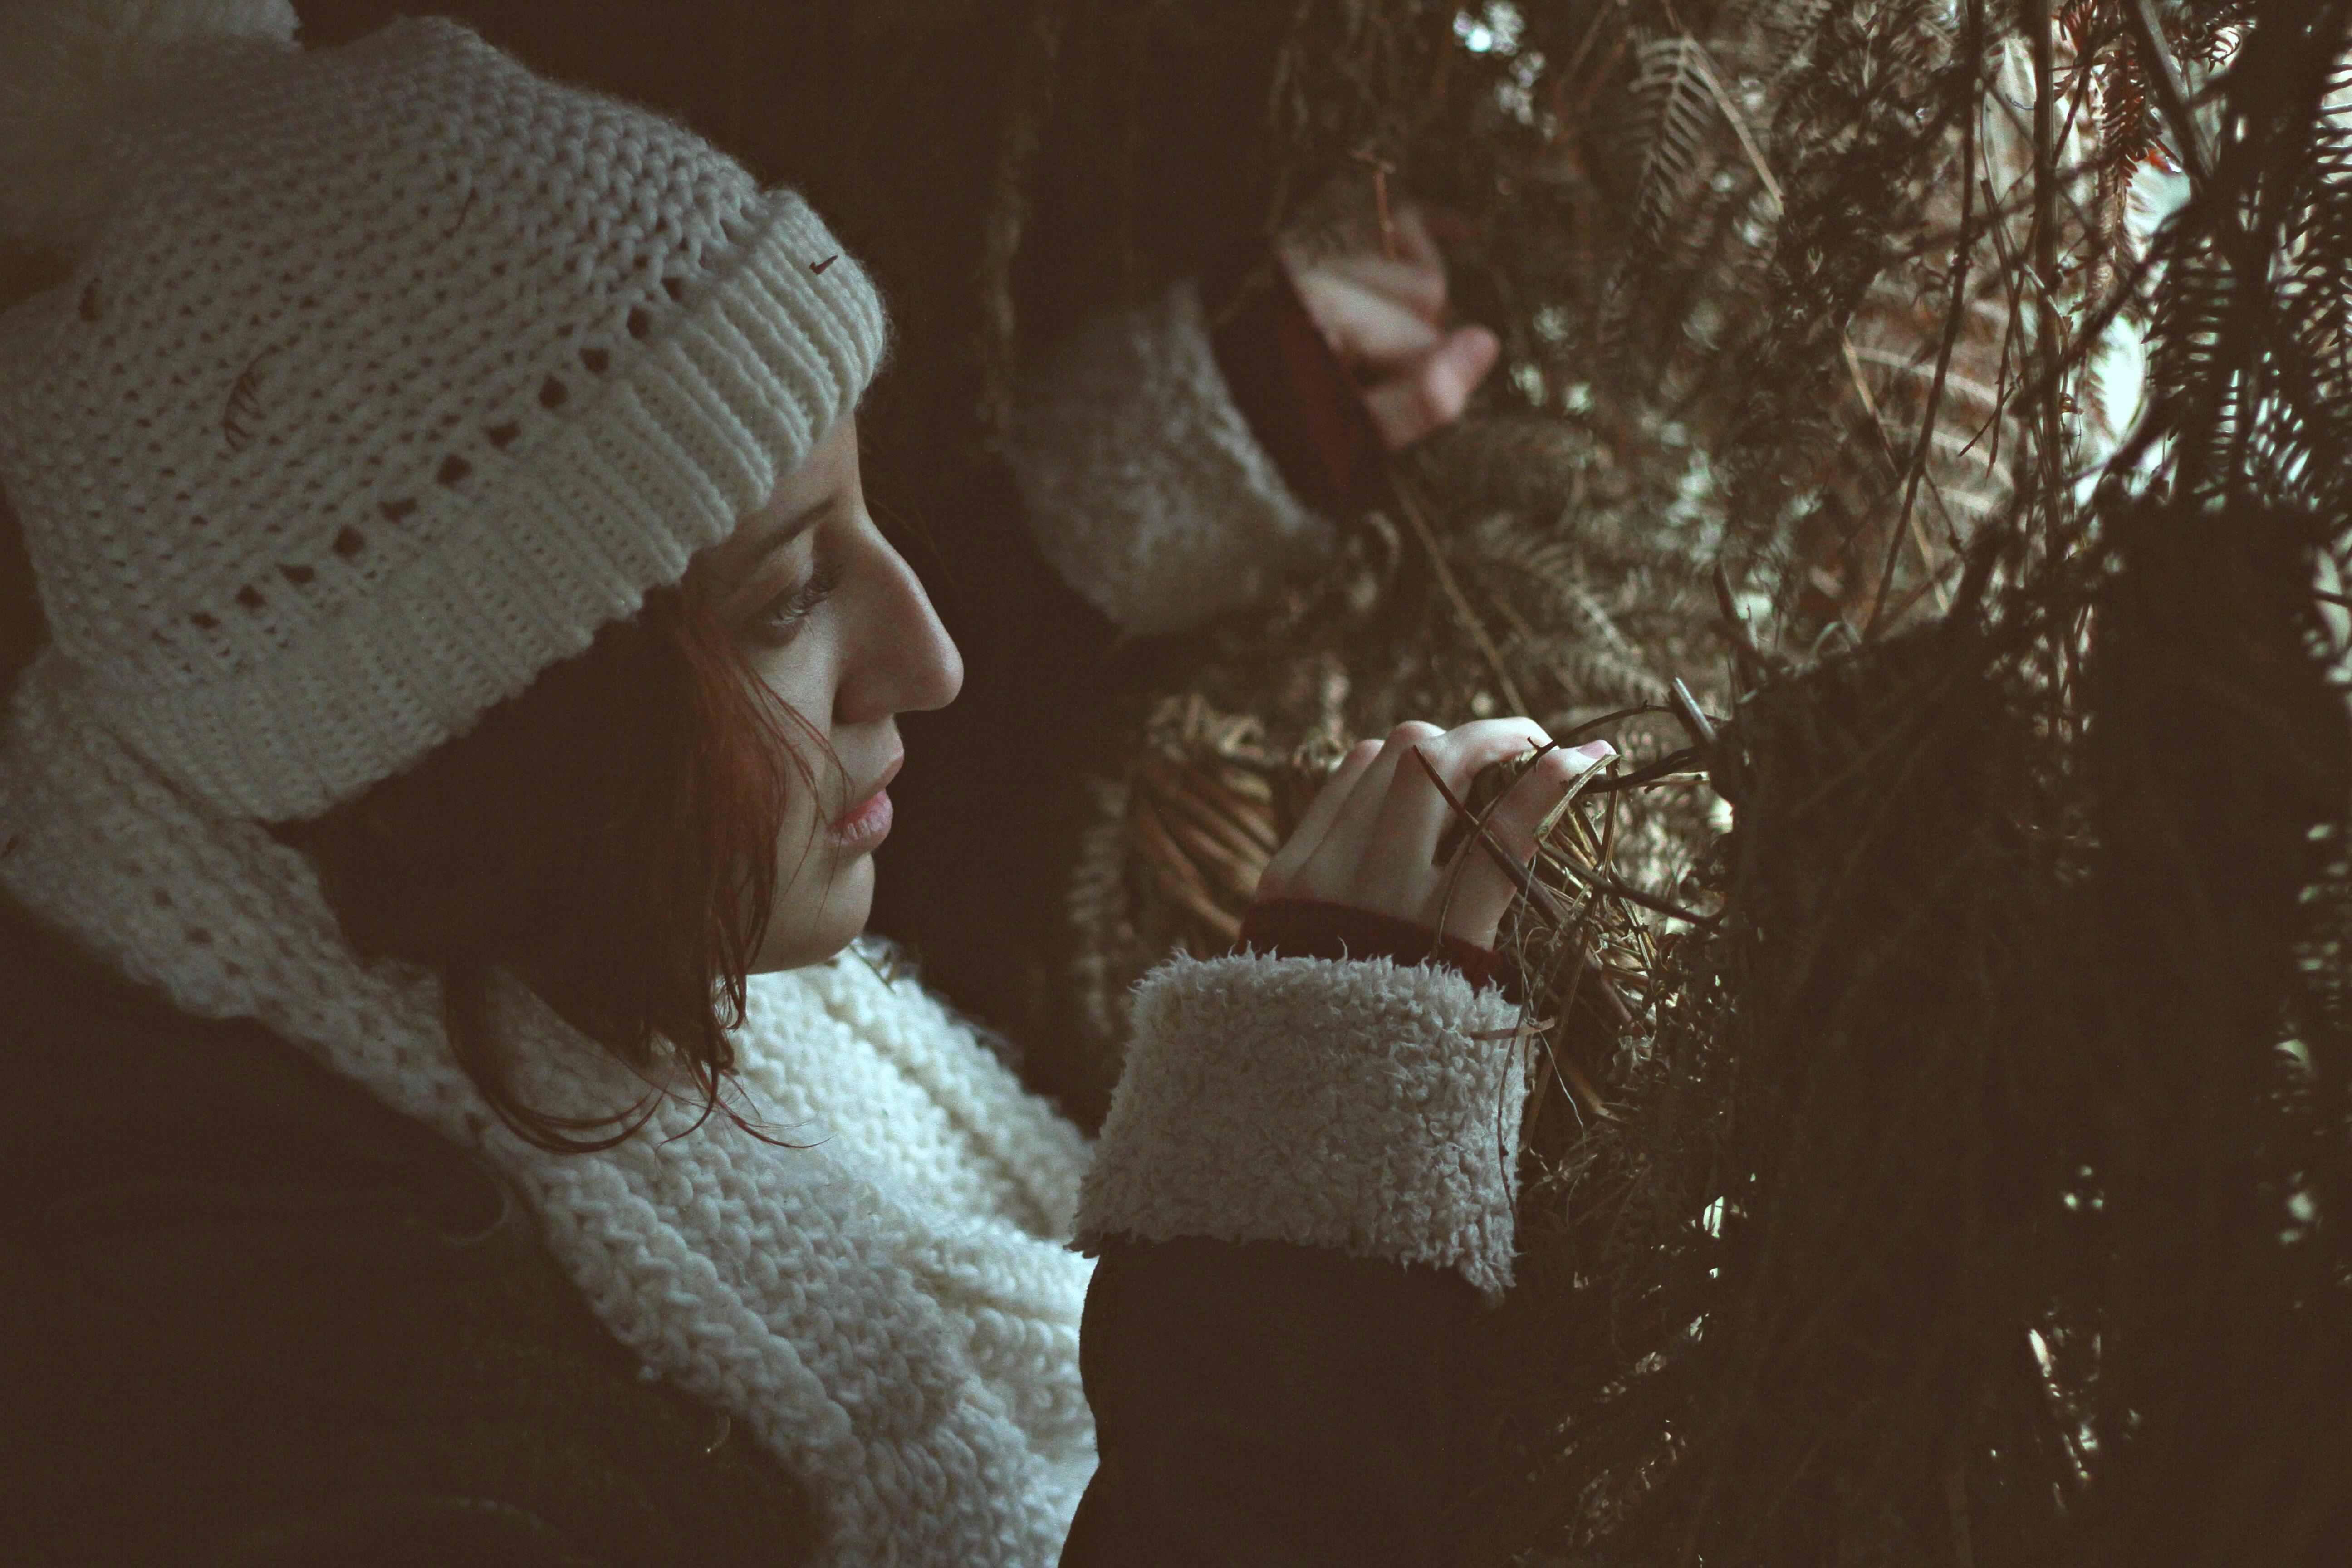 A woman in a knit cap peeking through dense needly branches